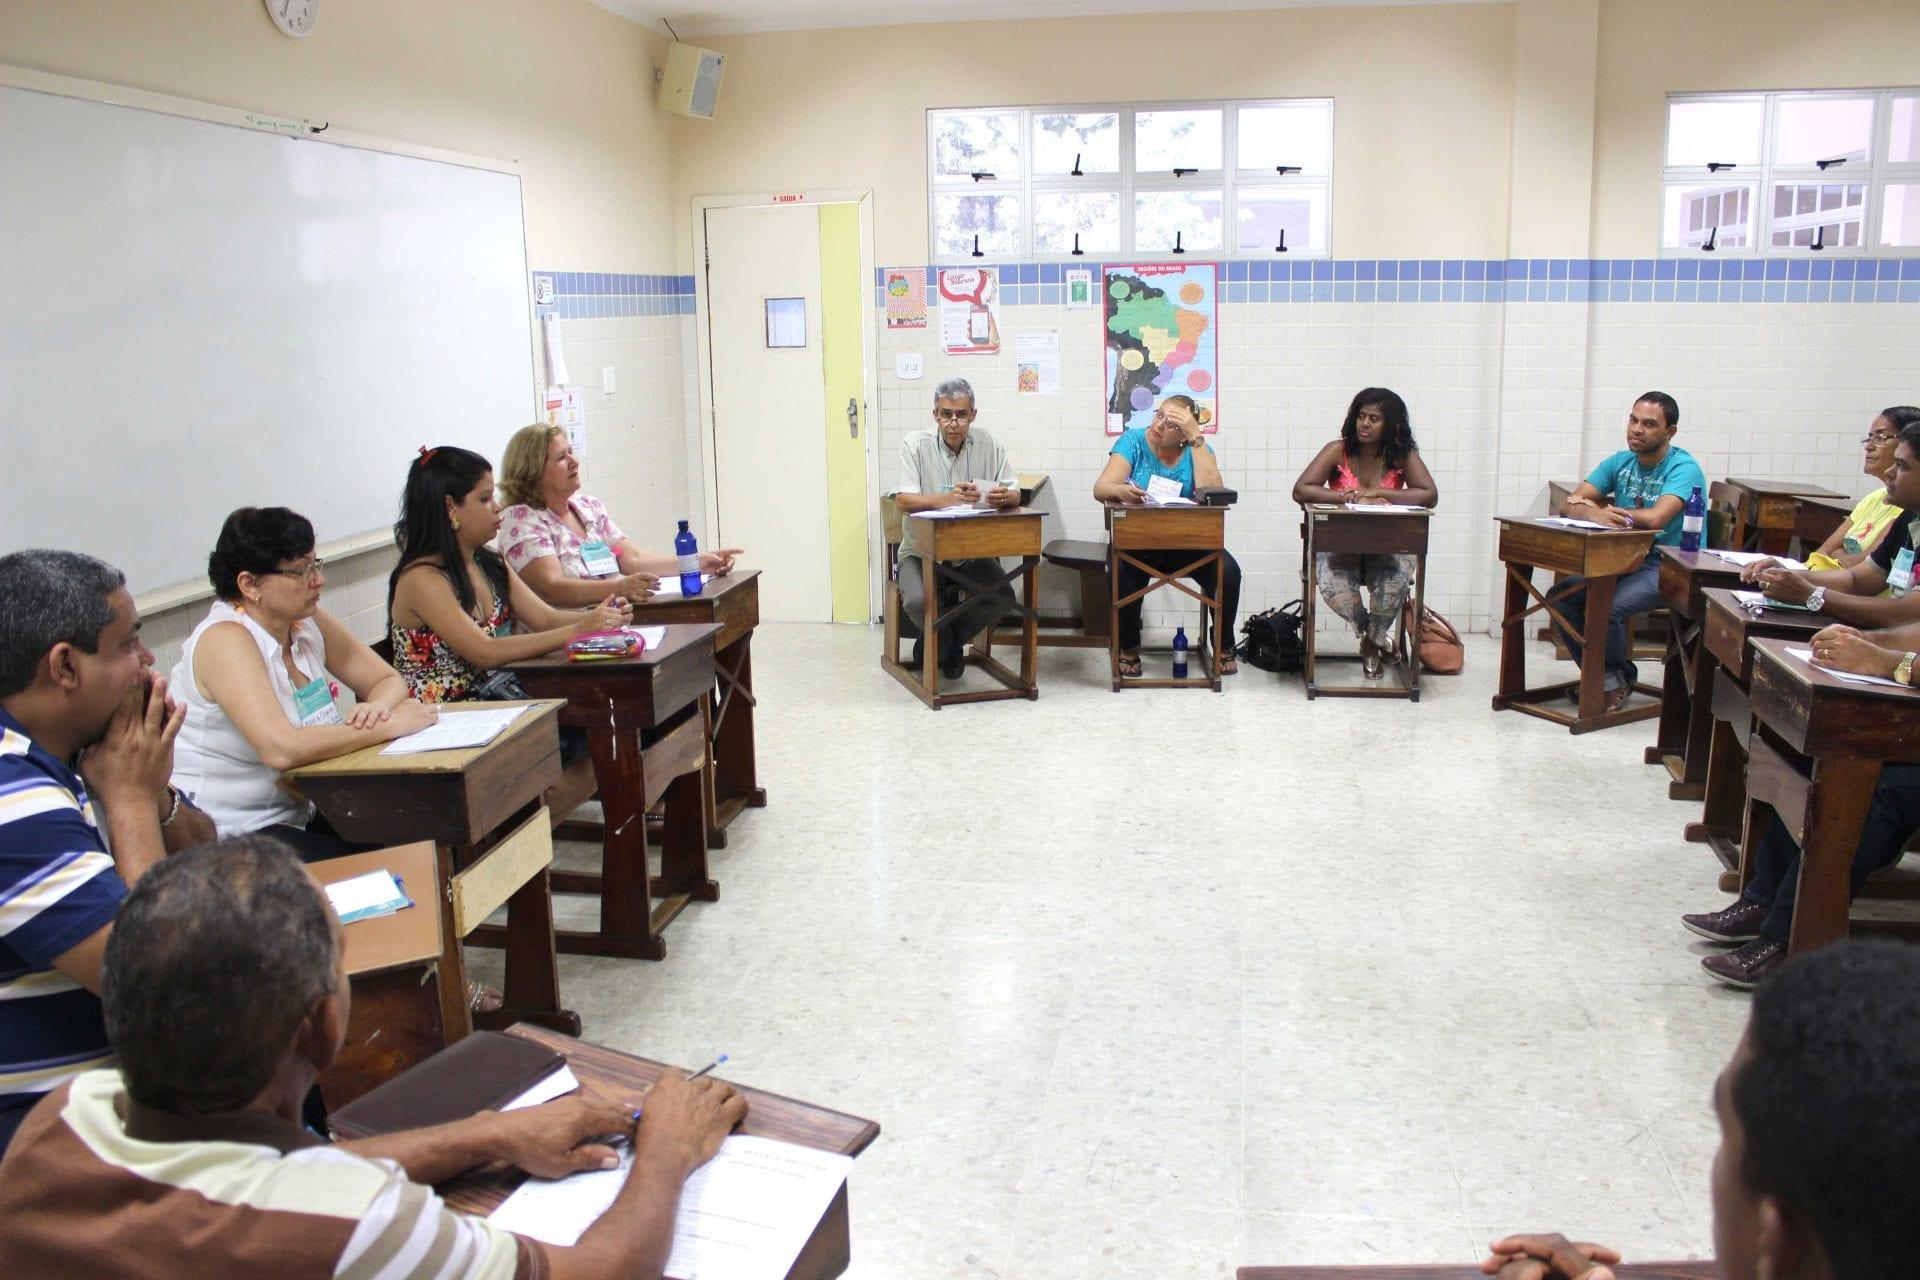 ESPECIAL ASSEMBLEIA – Diocese de Valadares Realiza Assembleia Diocesana